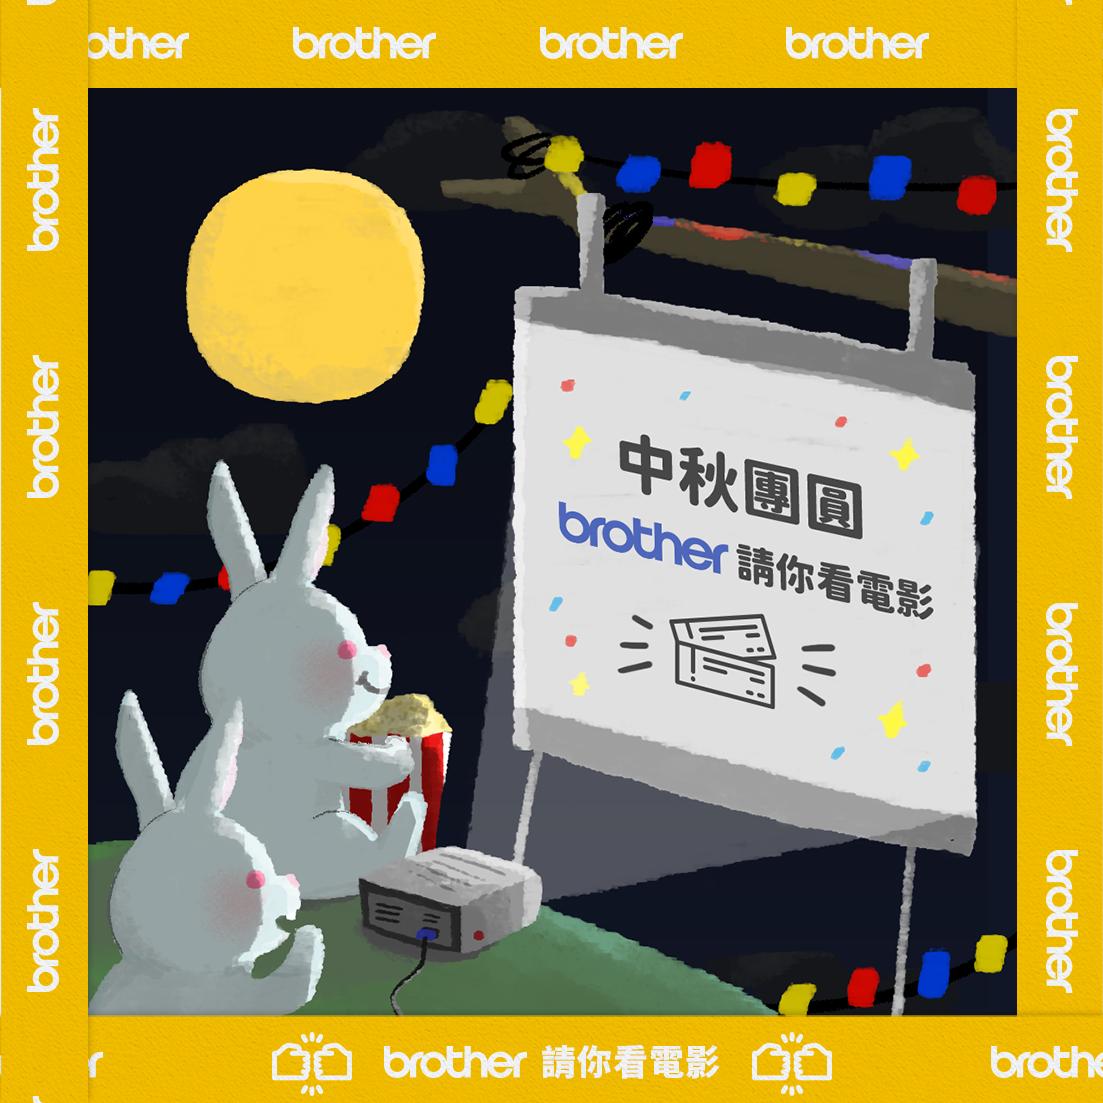 Brother 中秋請你看電影